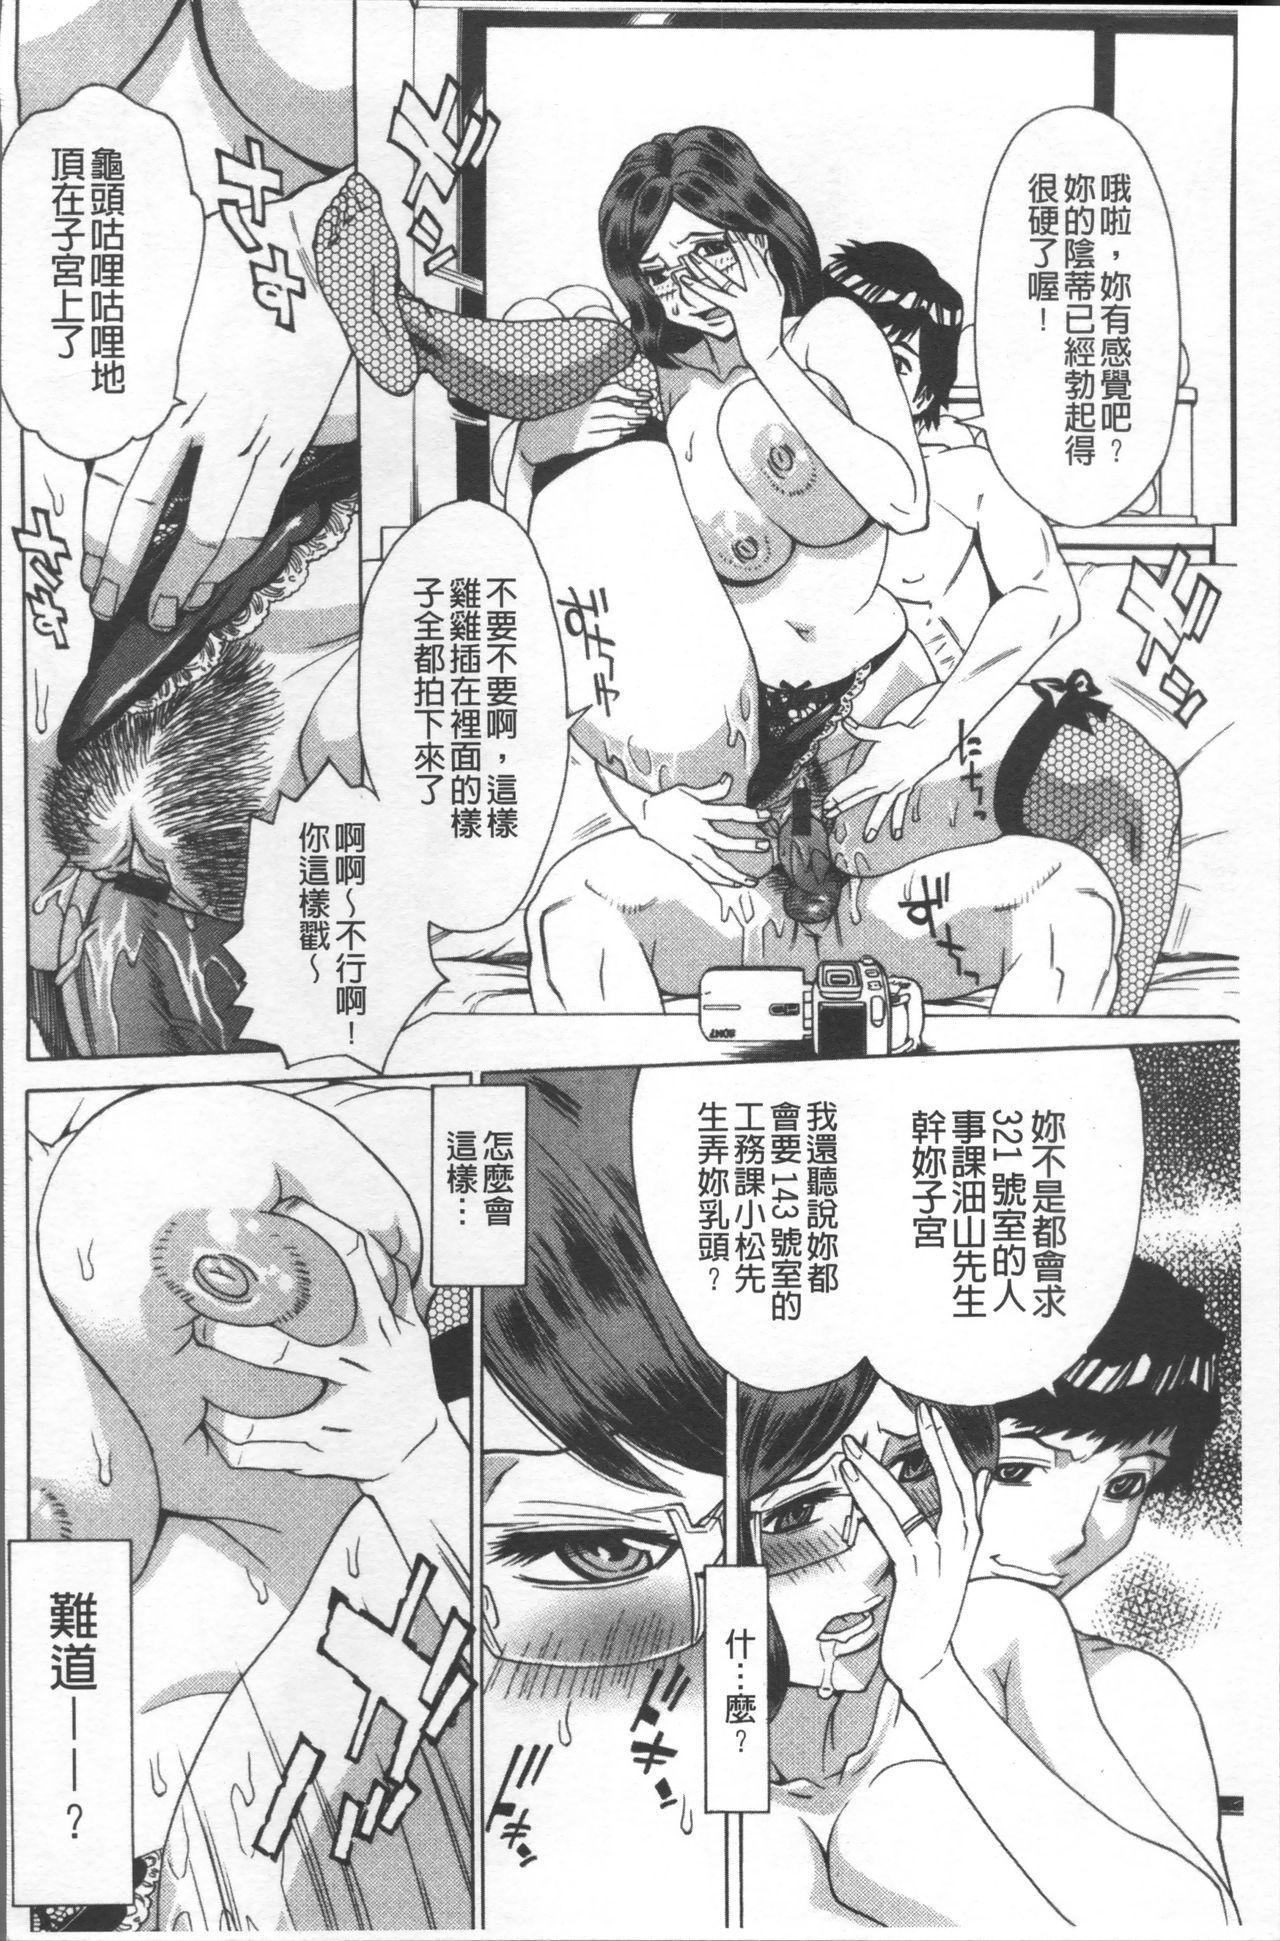 Hitozuma Kanshasai - SUPER EROTIC WIFE'S FESTIVAL 37